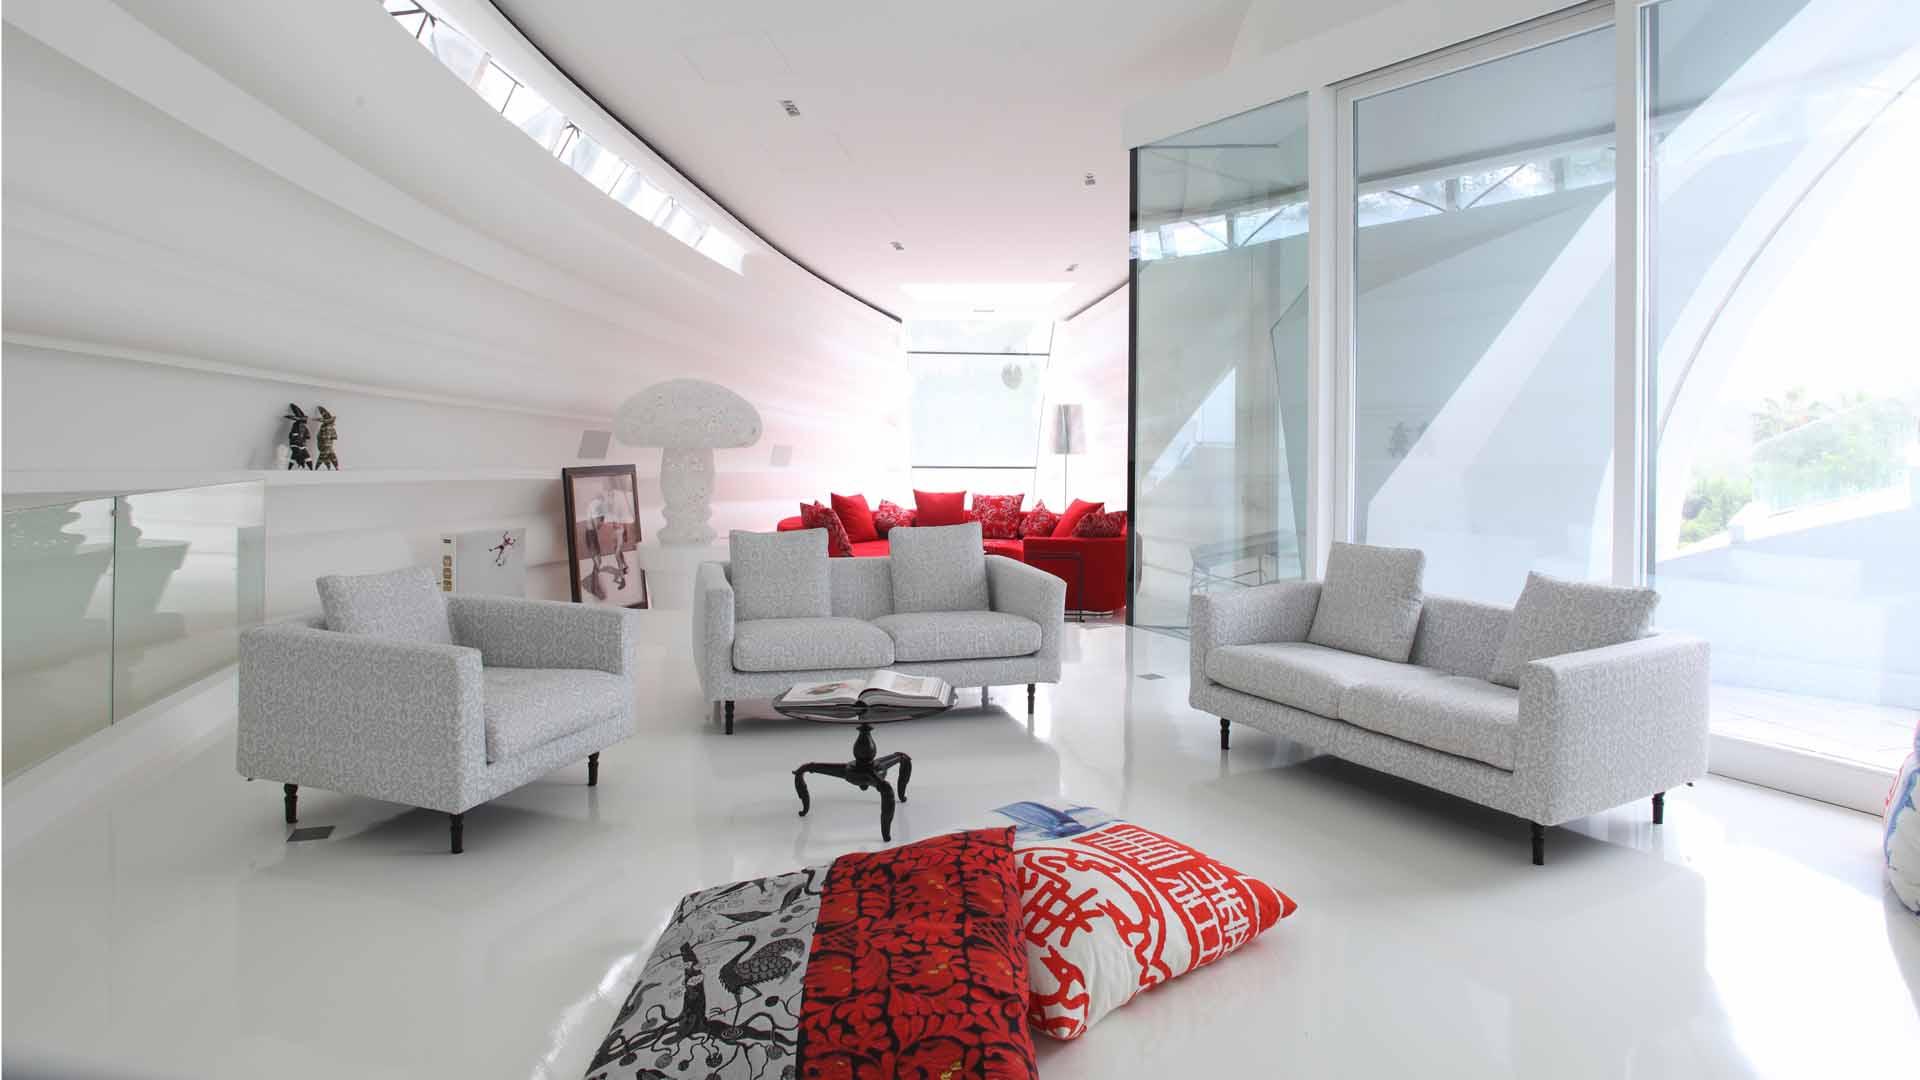 Ultramodern Casa Son Vida by tecArchitecture and Marcel Wanders Studio-22